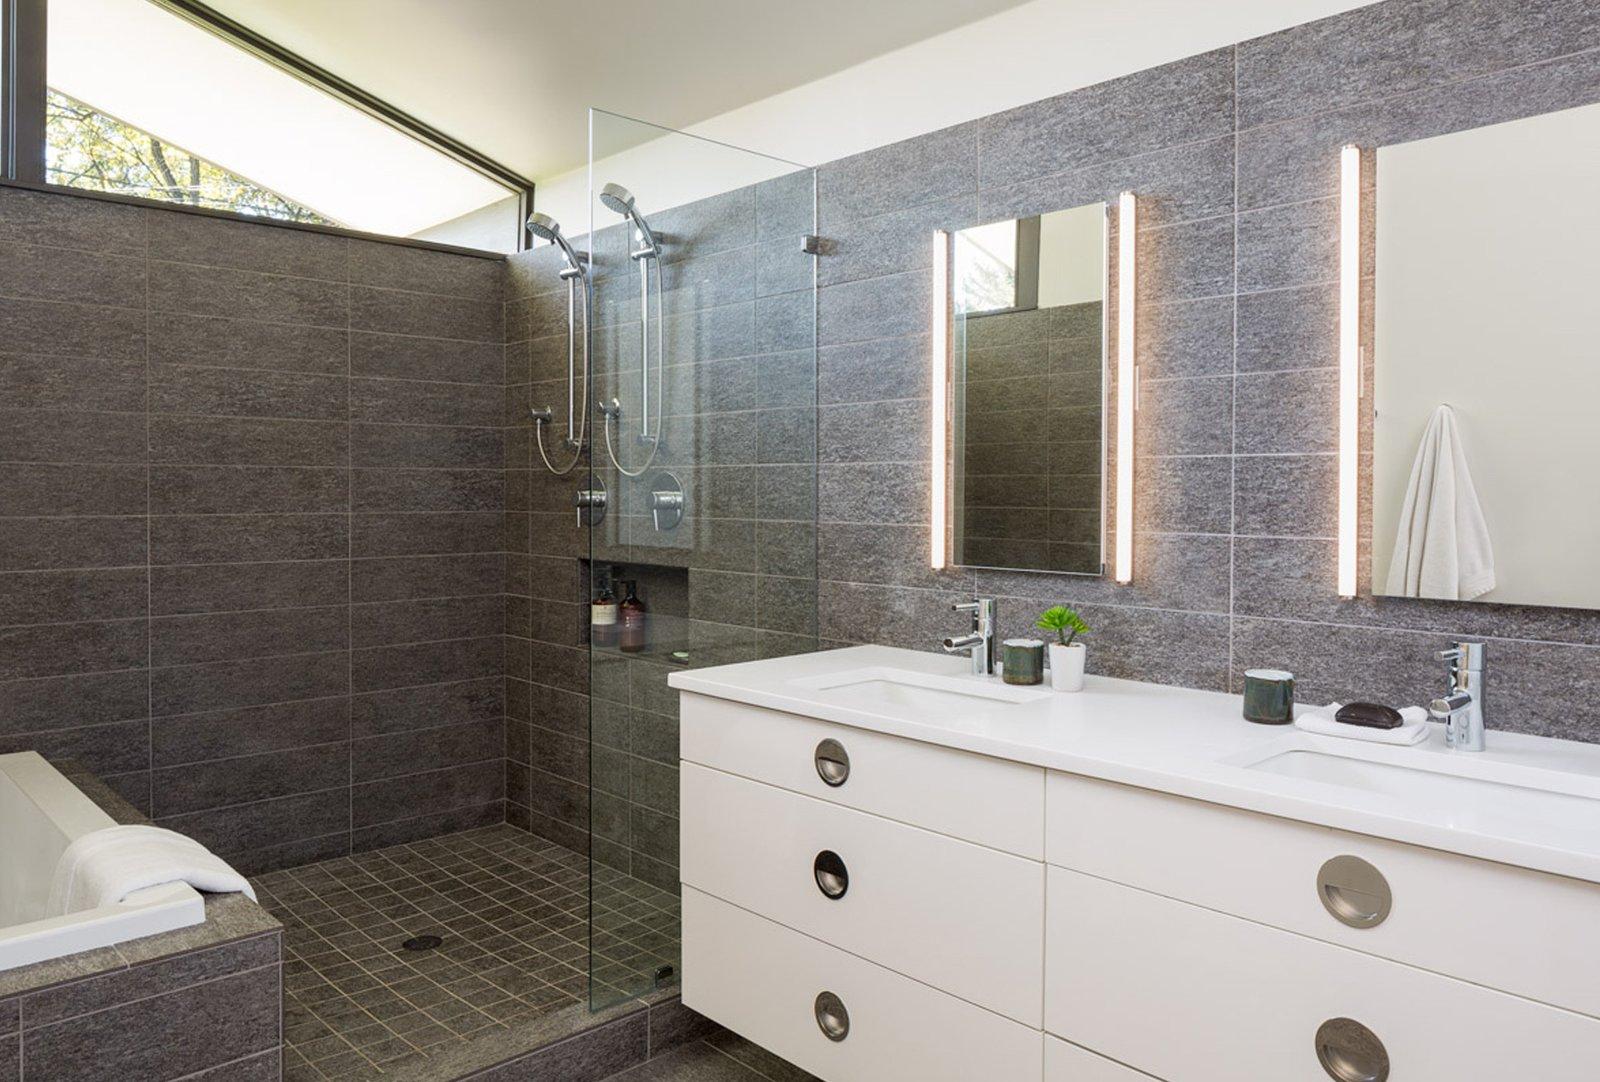 Tagged: Bath Room and Drop In Tub.  Mid Century Re-Modern by HMHAI